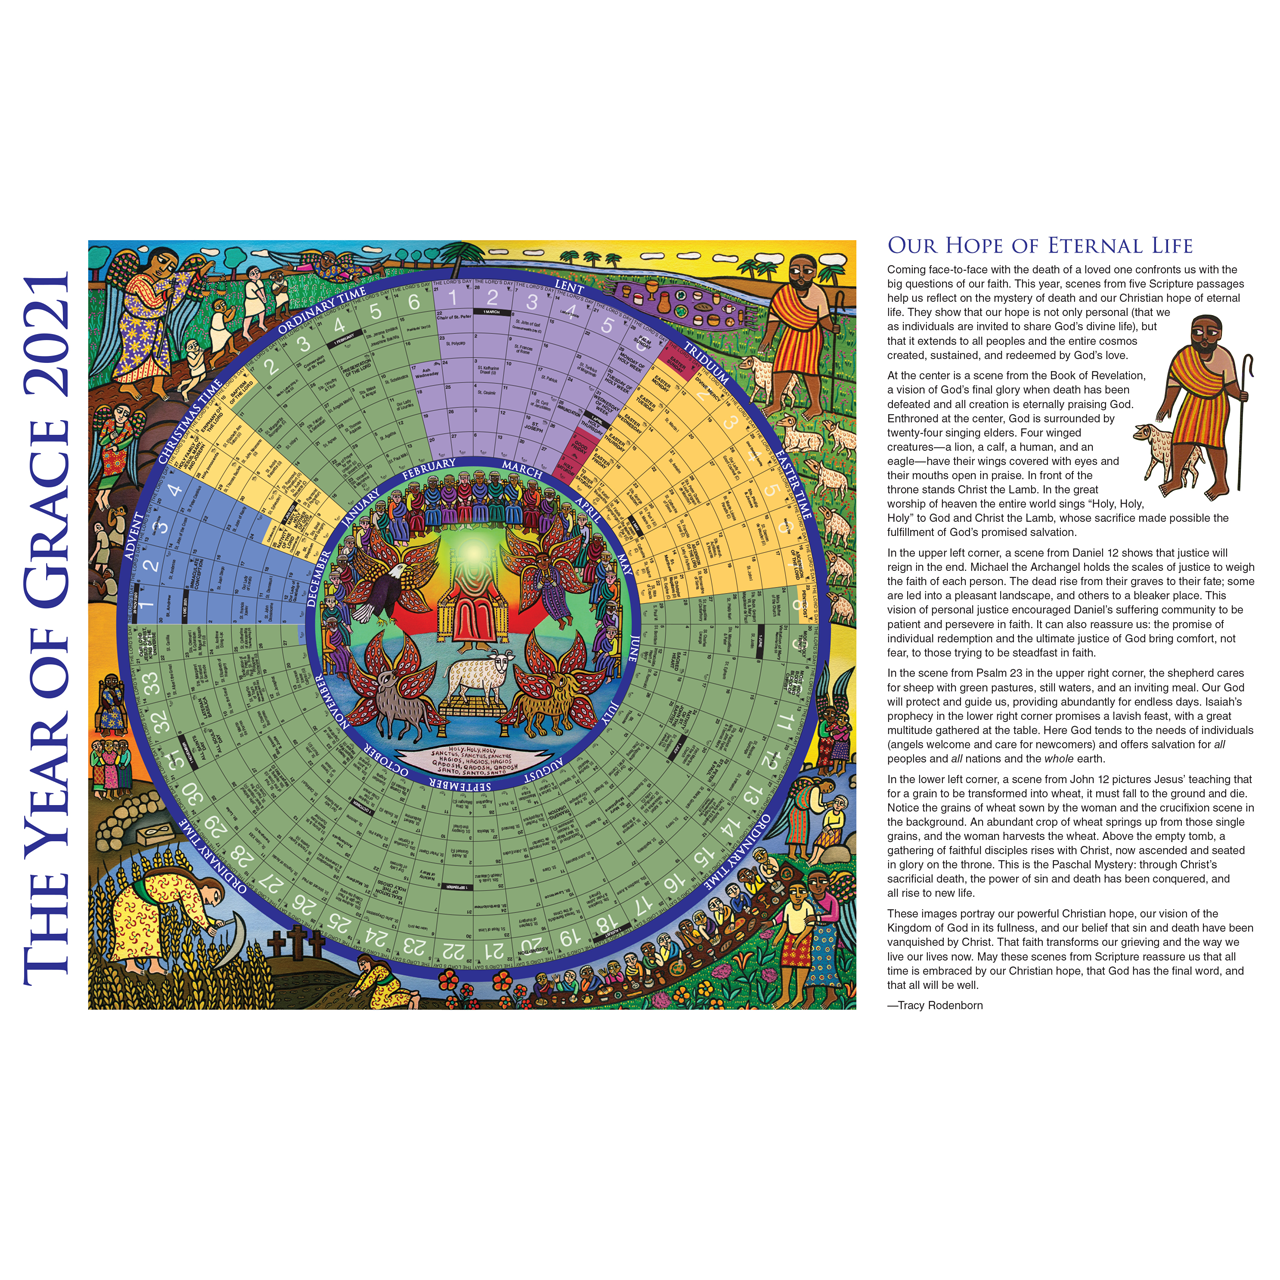 2022 Lectionary Calendar.2021 Year Of Grace Liturgical Calendar Small 25 Per Package 11 X 17 Yg21sp F C Ziegler Company